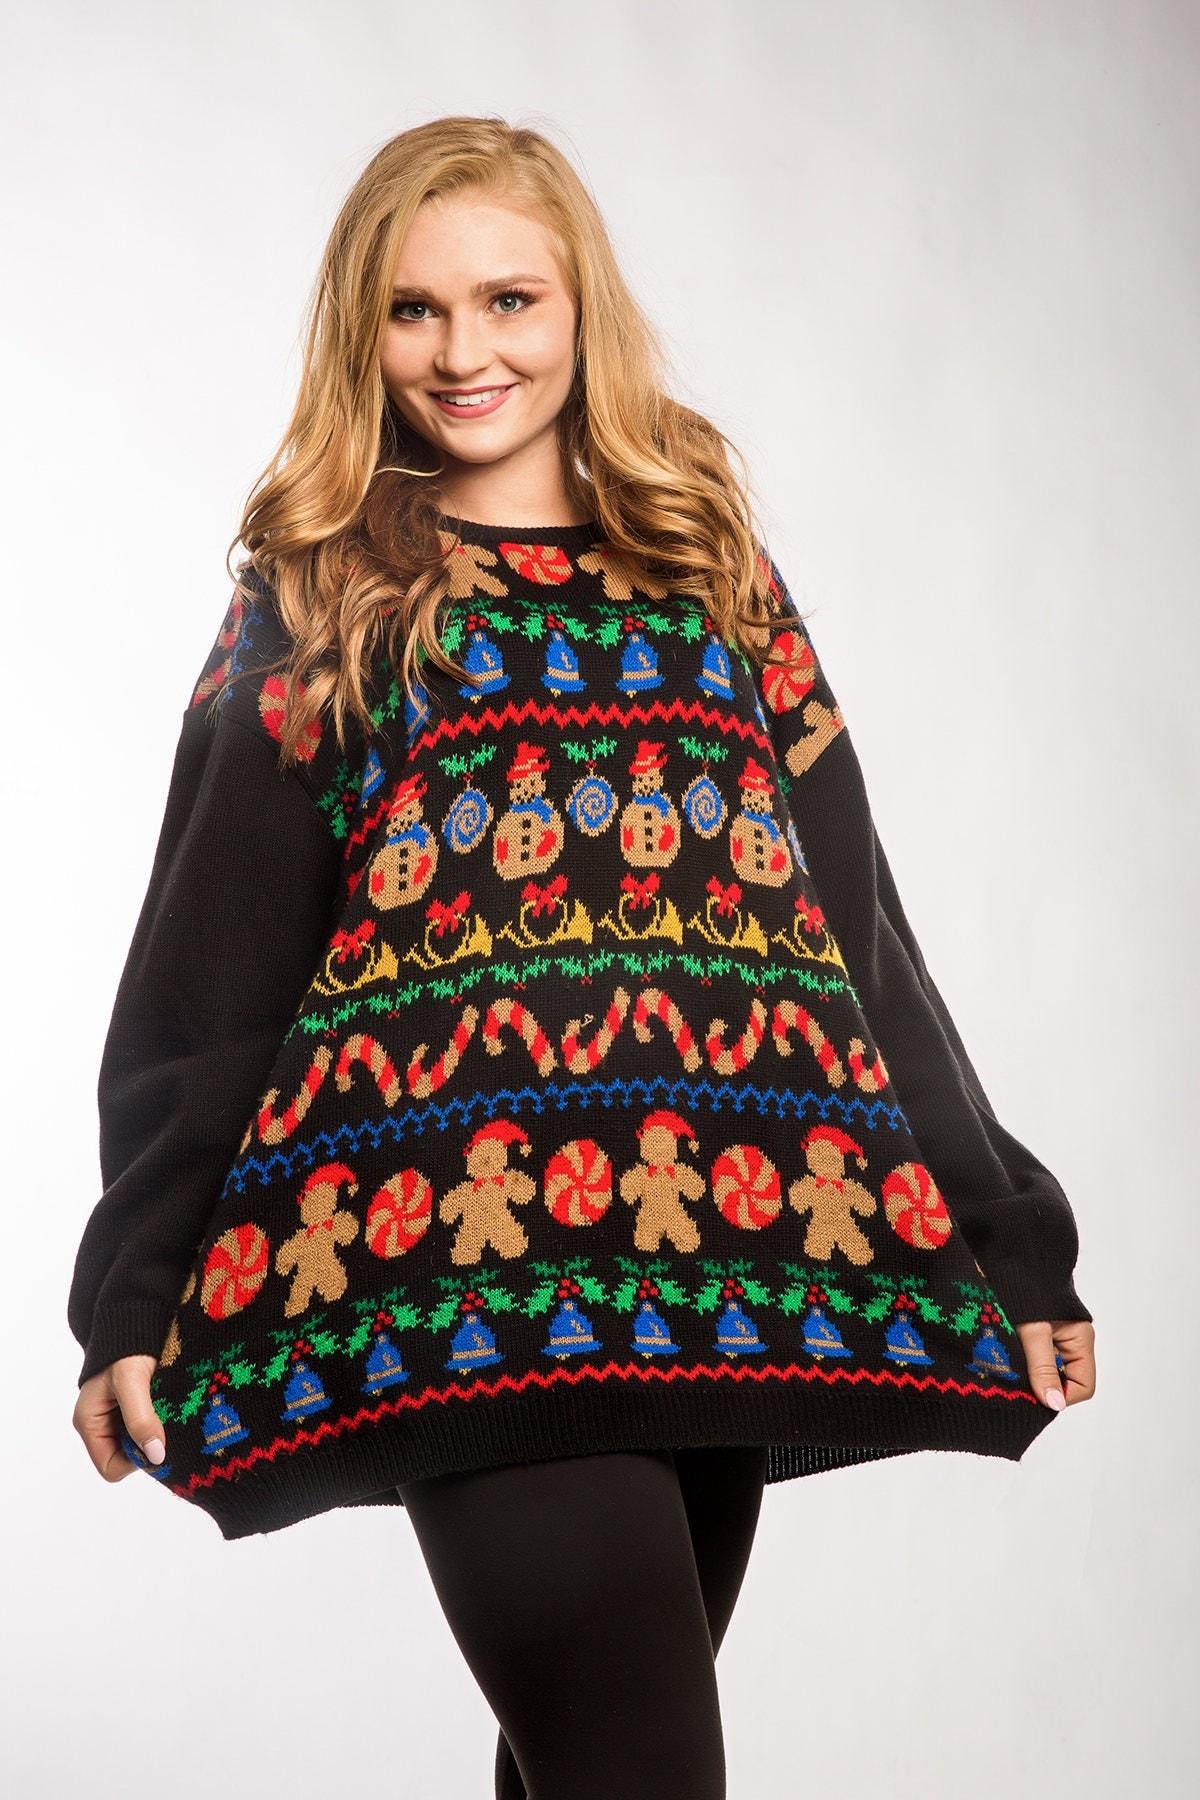 Oversized Vintage Ugly Christmas Sweater Dress XXXL | Holiday Xmas ...